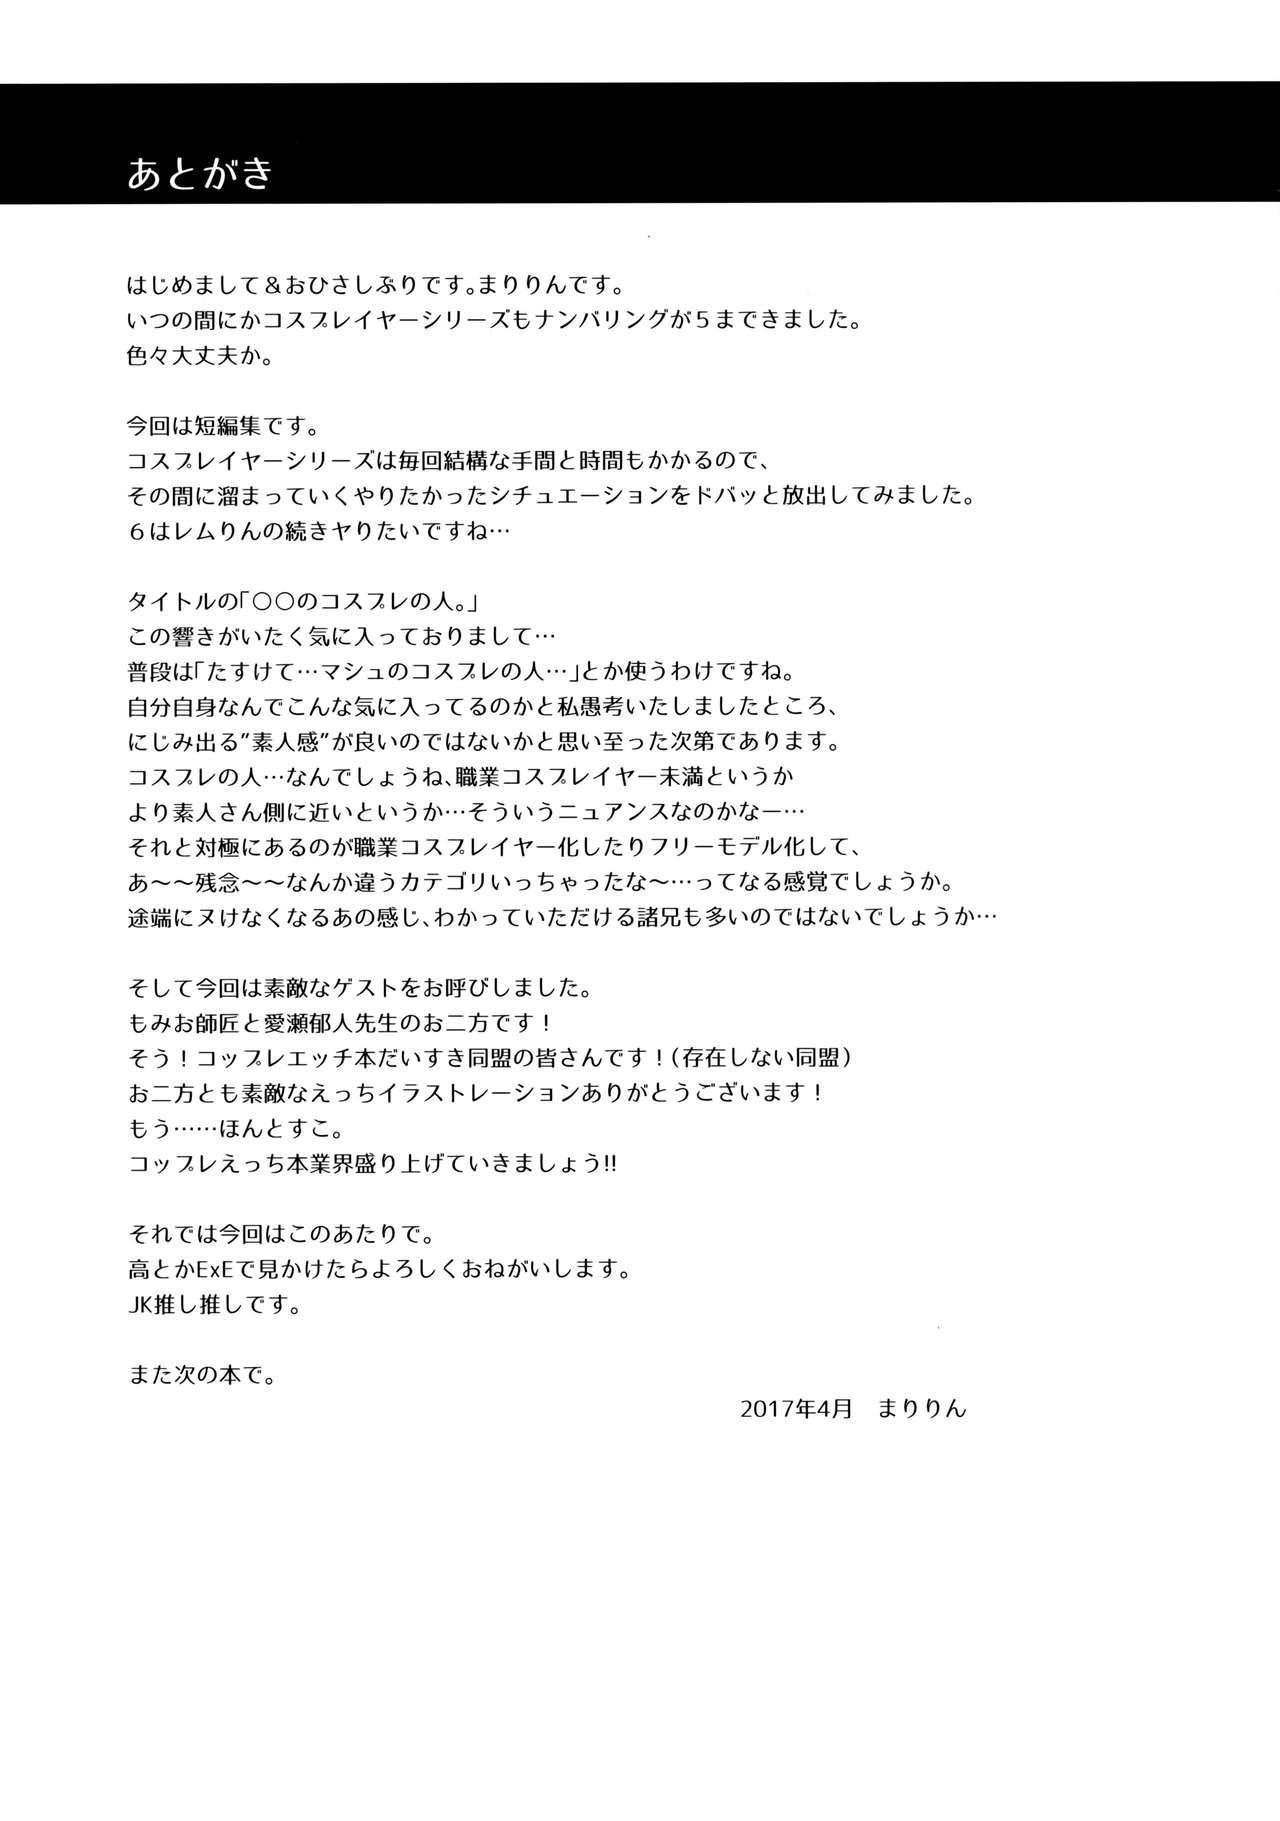 ○○ no Cosplay no Hito. 15